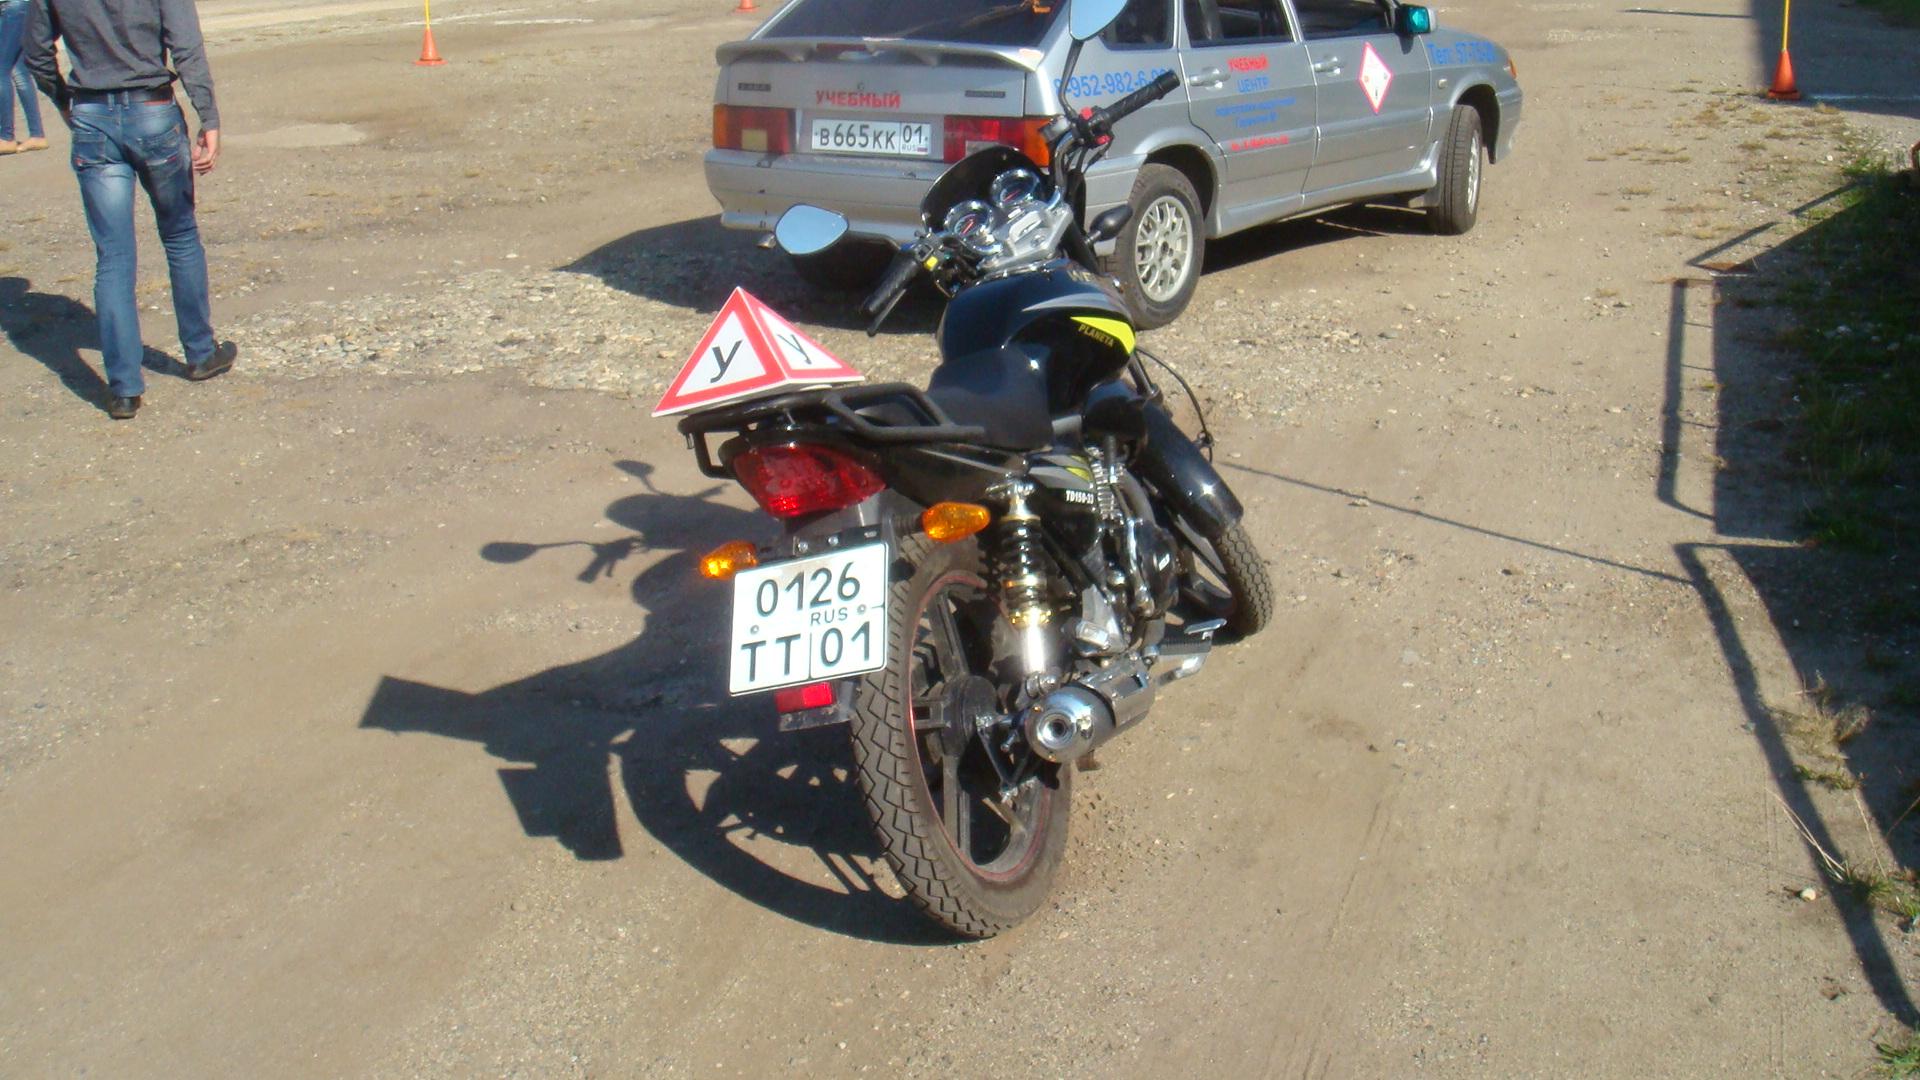 LNYE TD-150-33